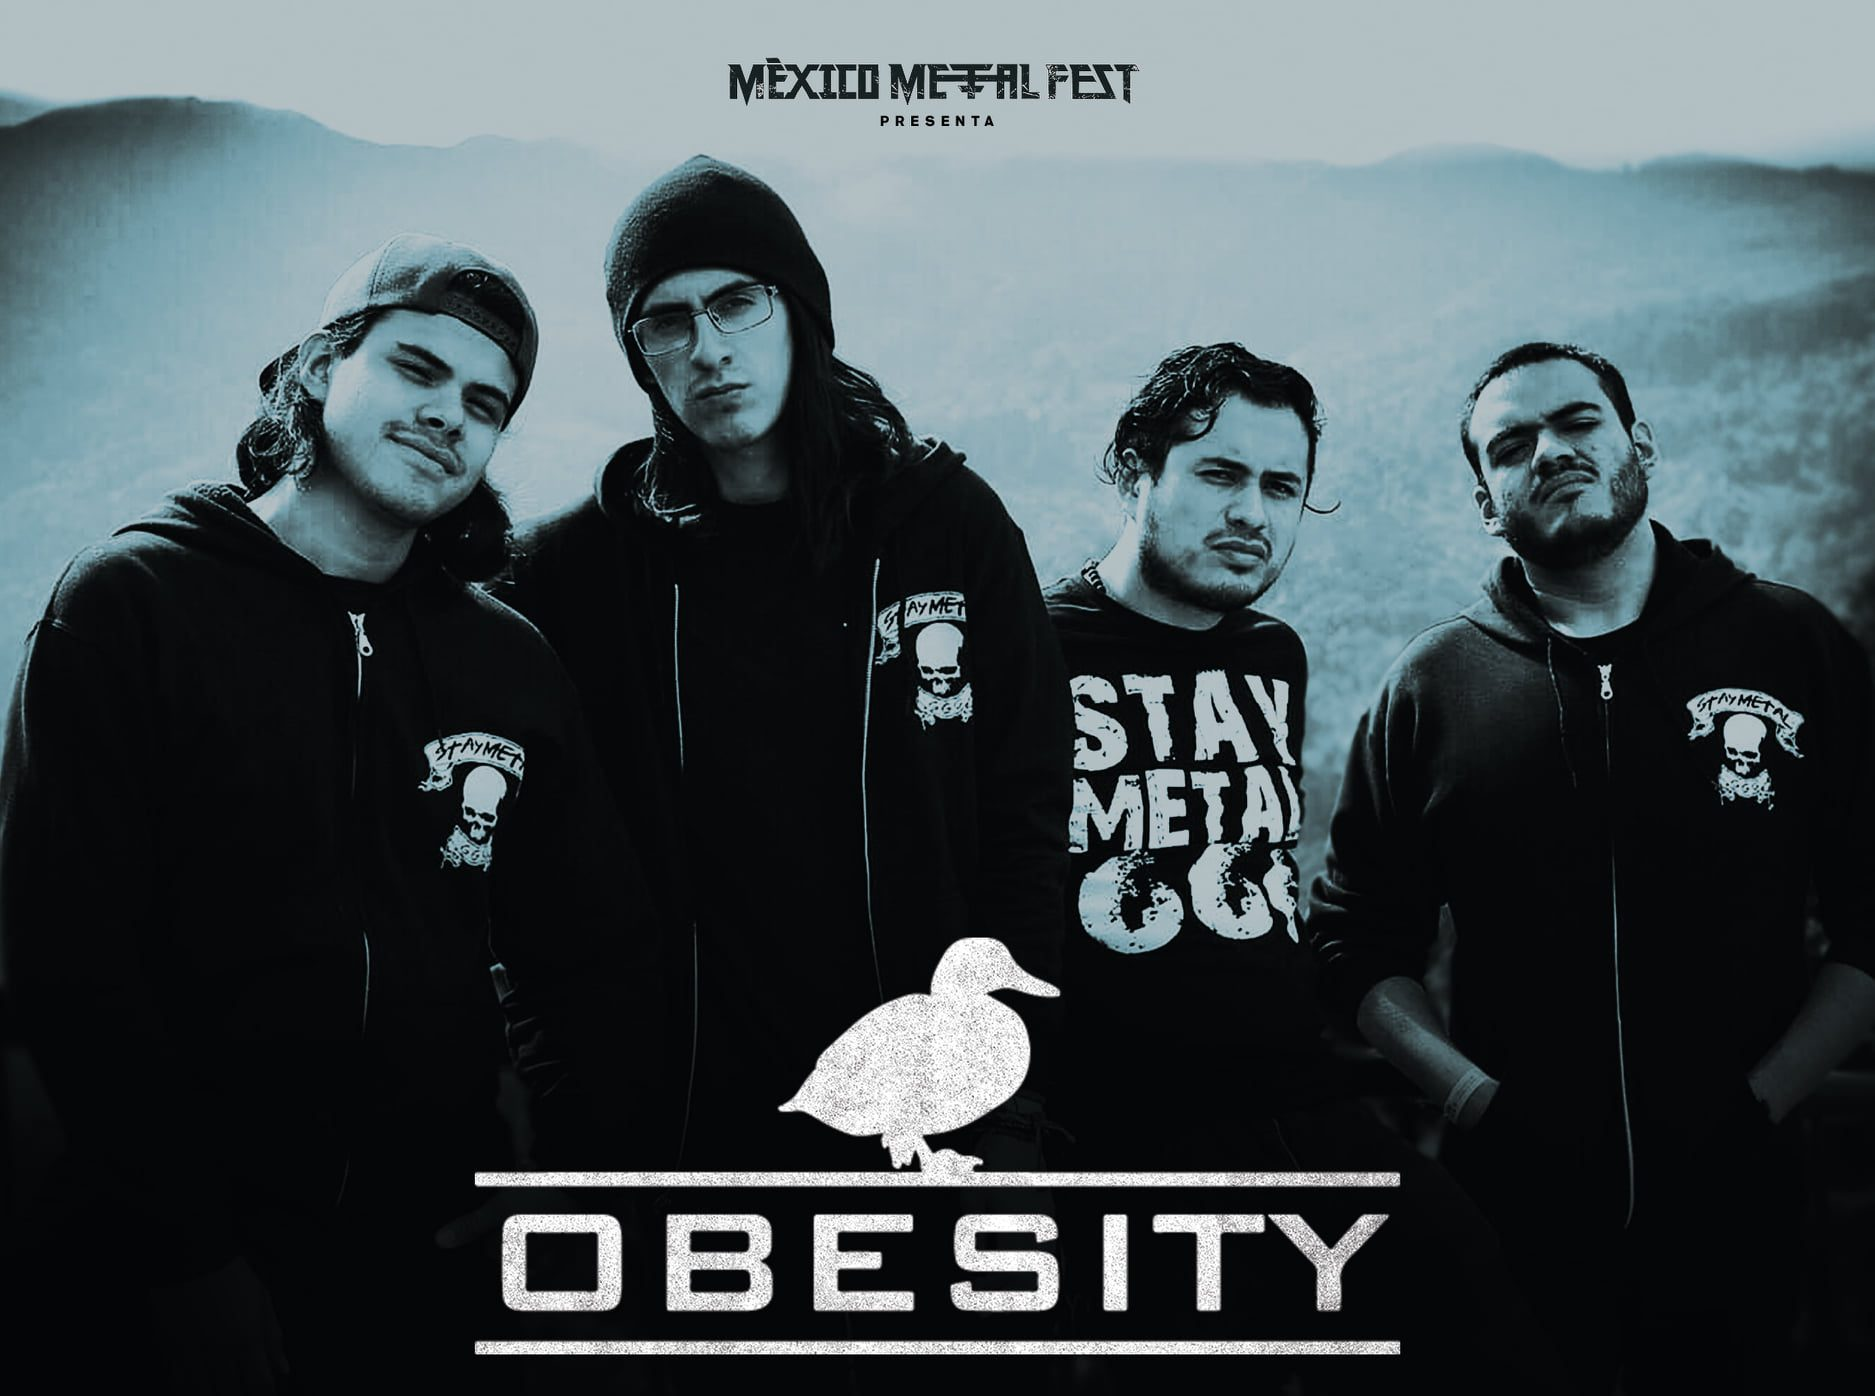 México Metal Fest Obesity Streaming